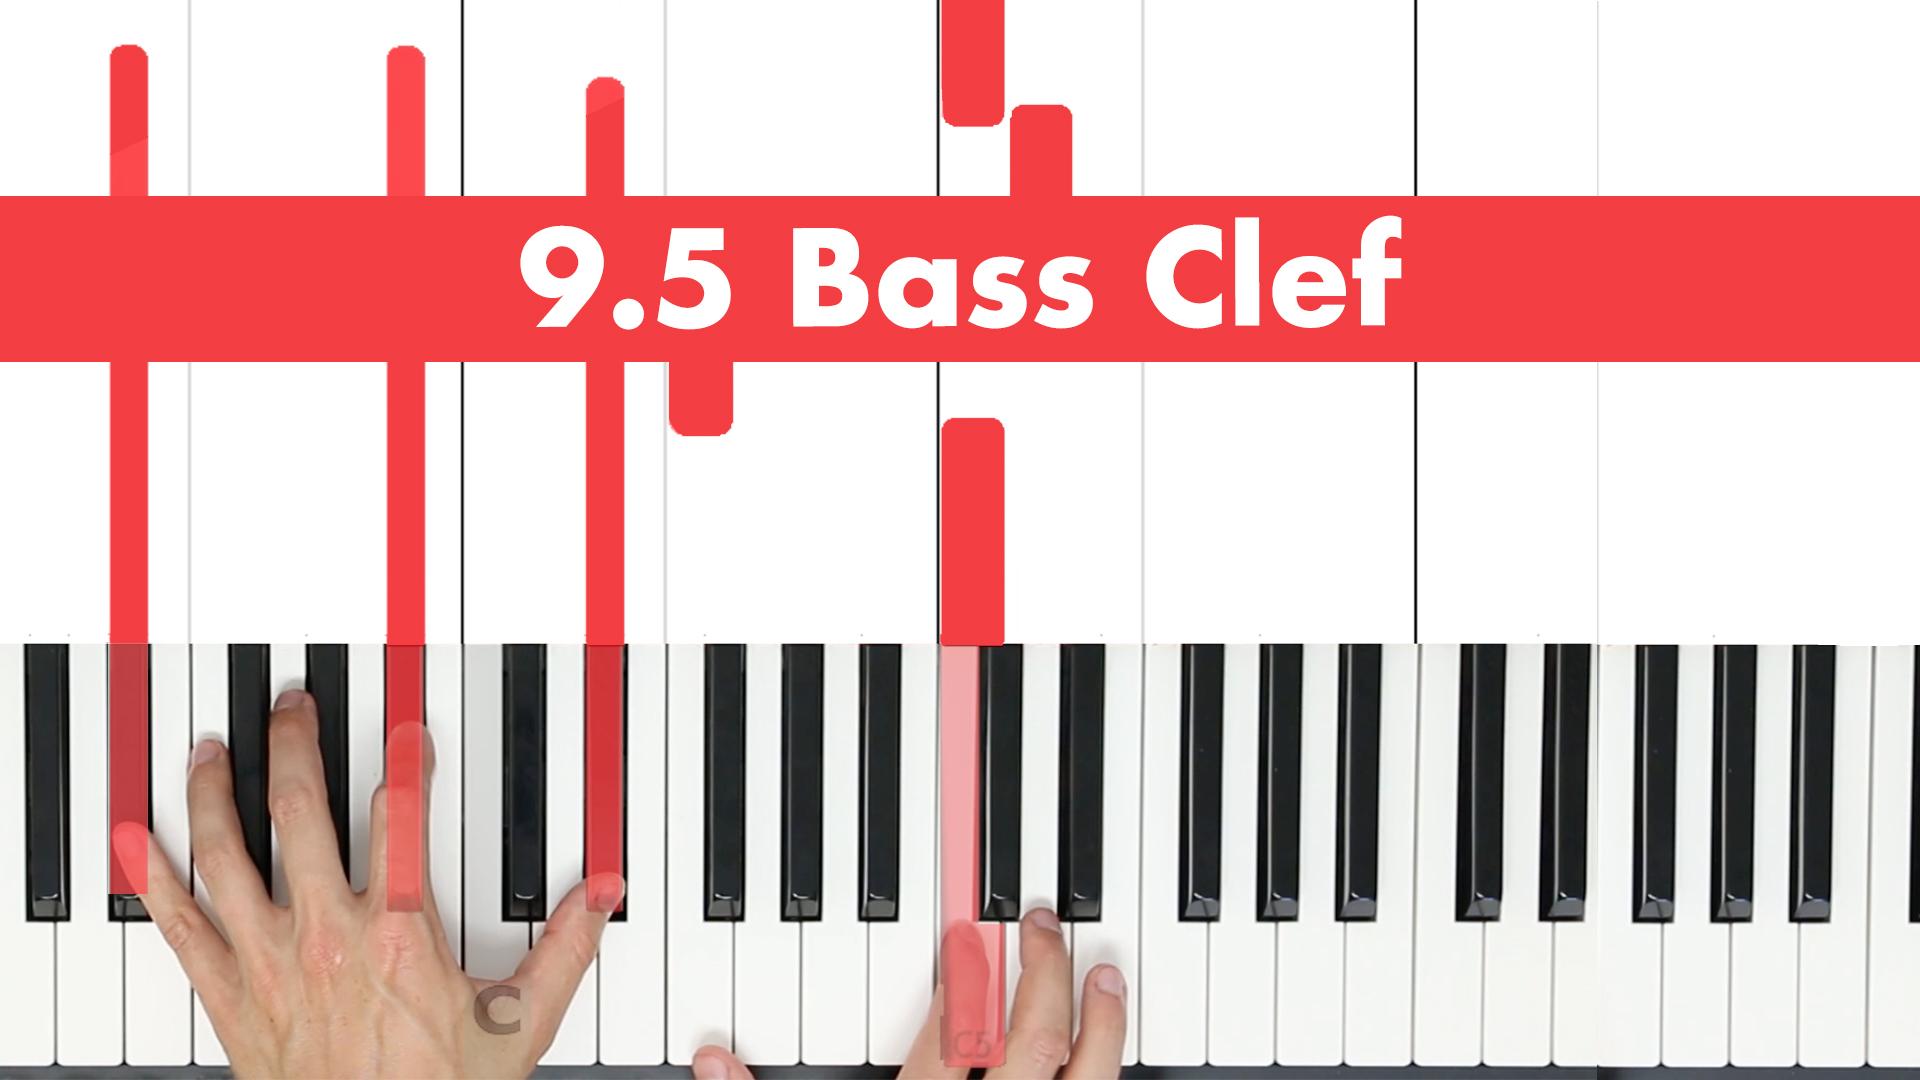 9.5 Bass Clef